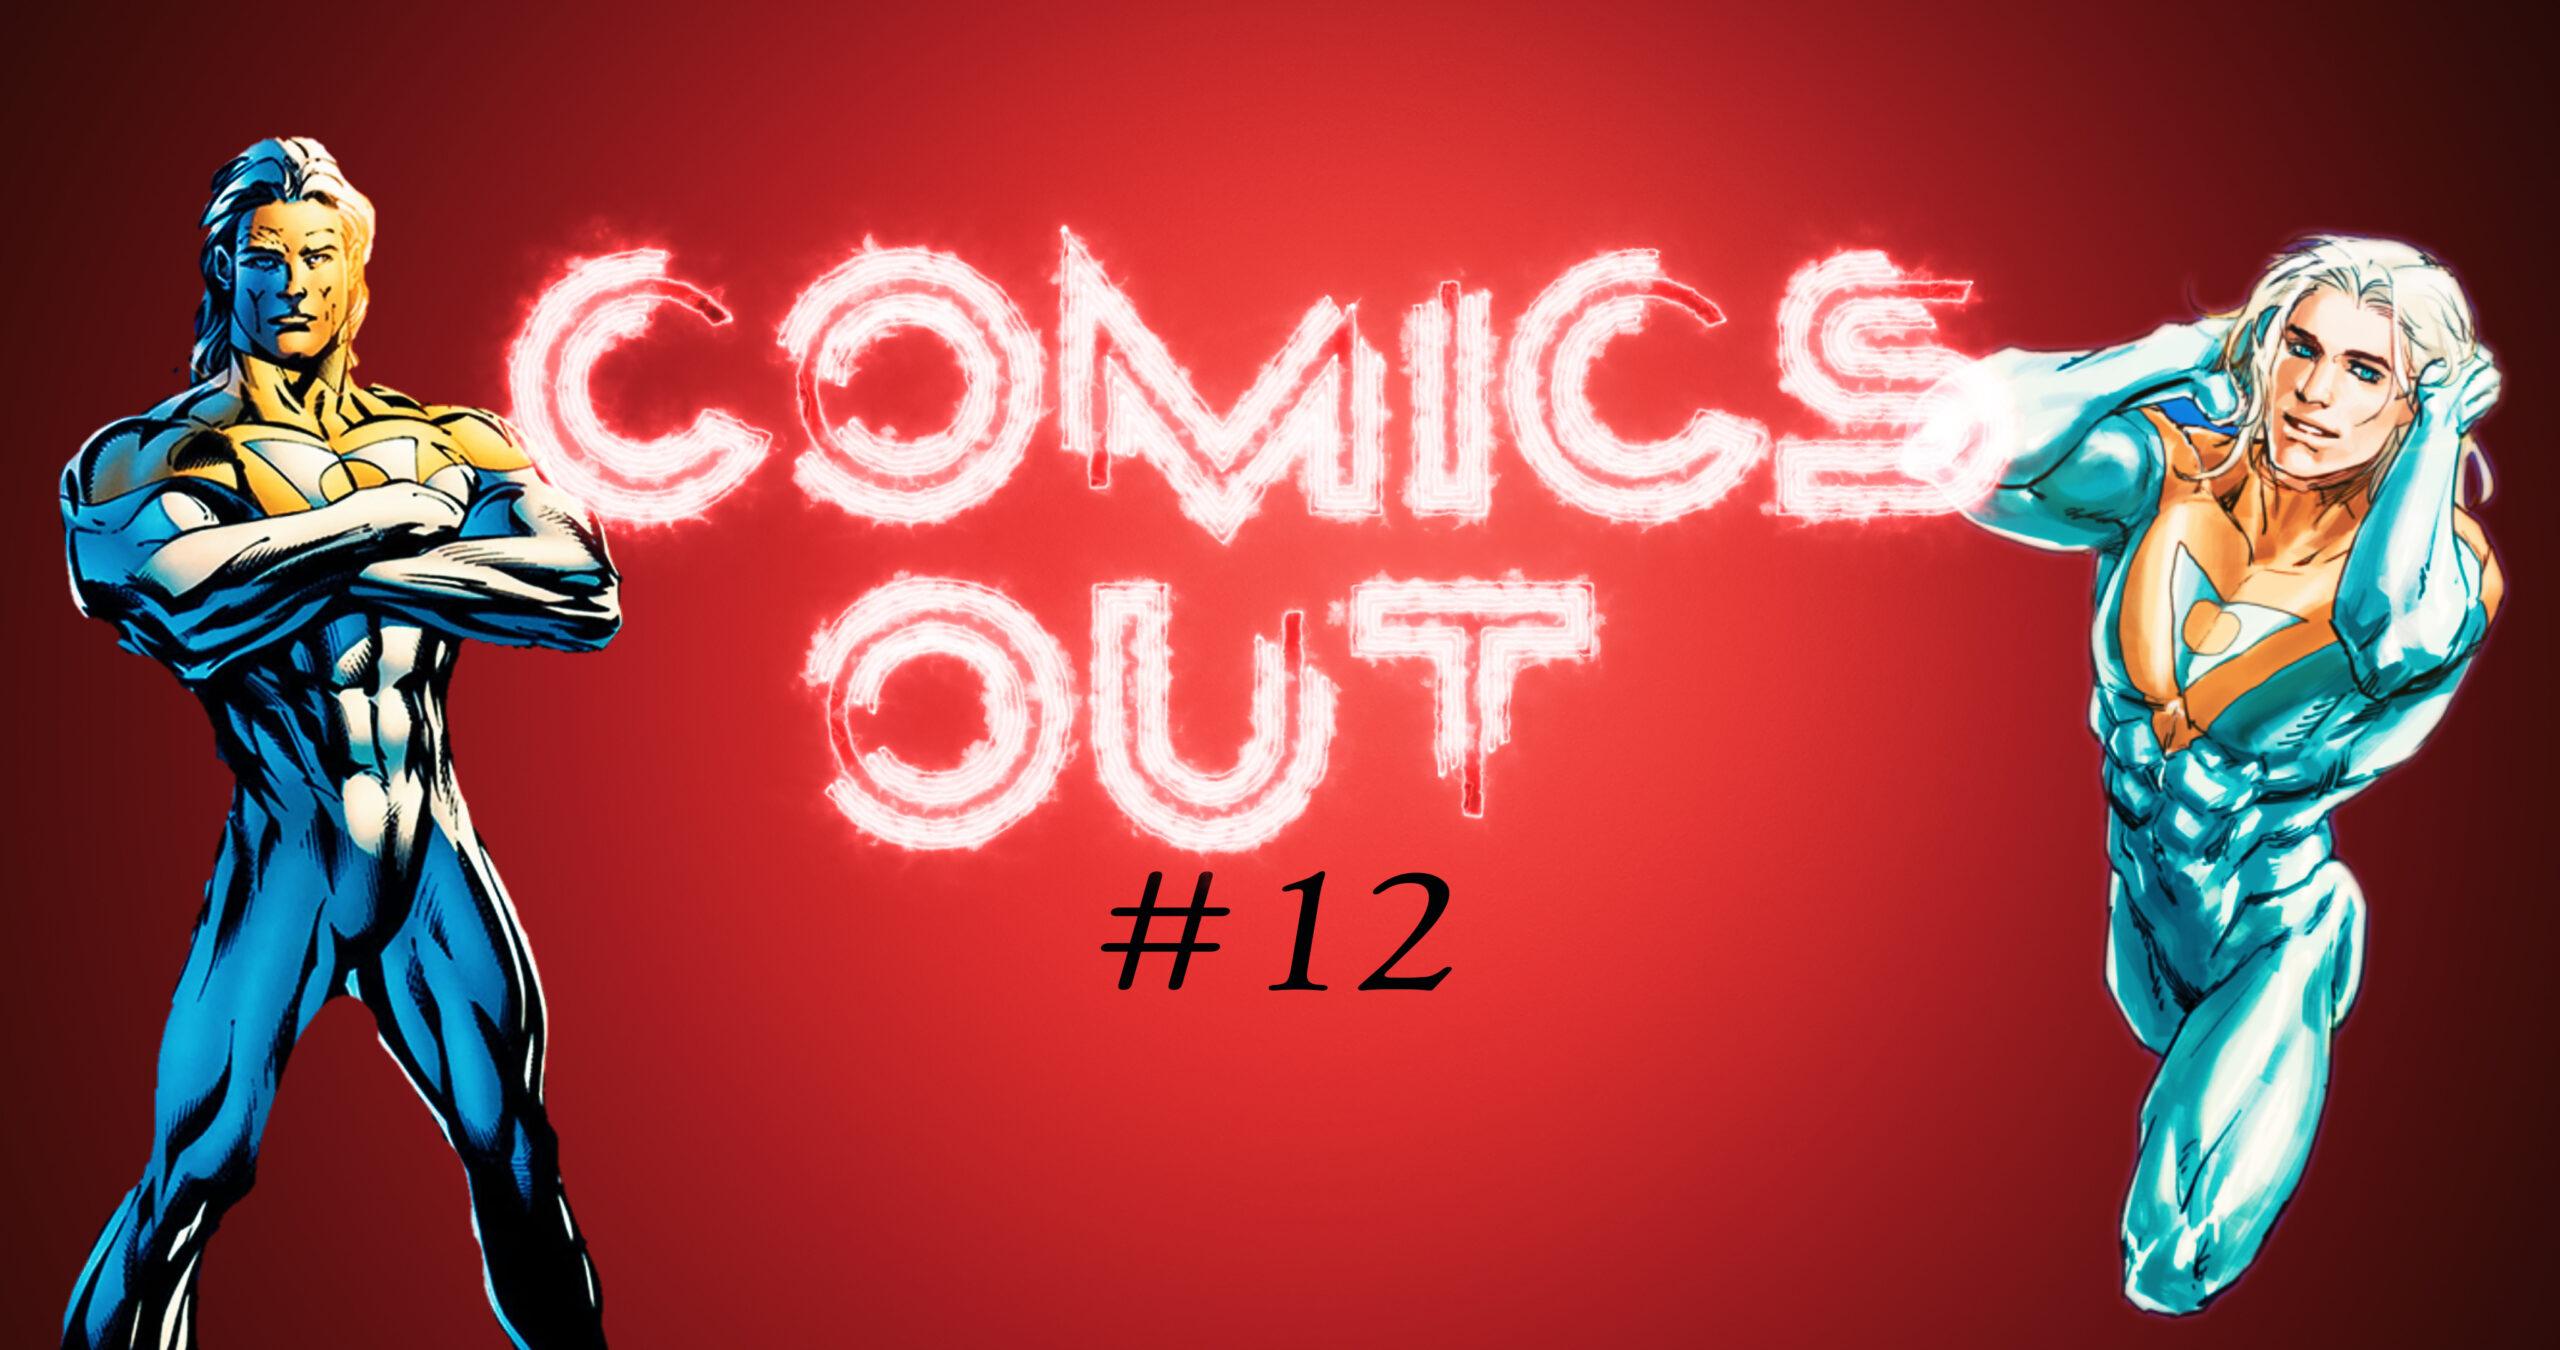 COMICS OUT: Apollo | L'Univers des Comics